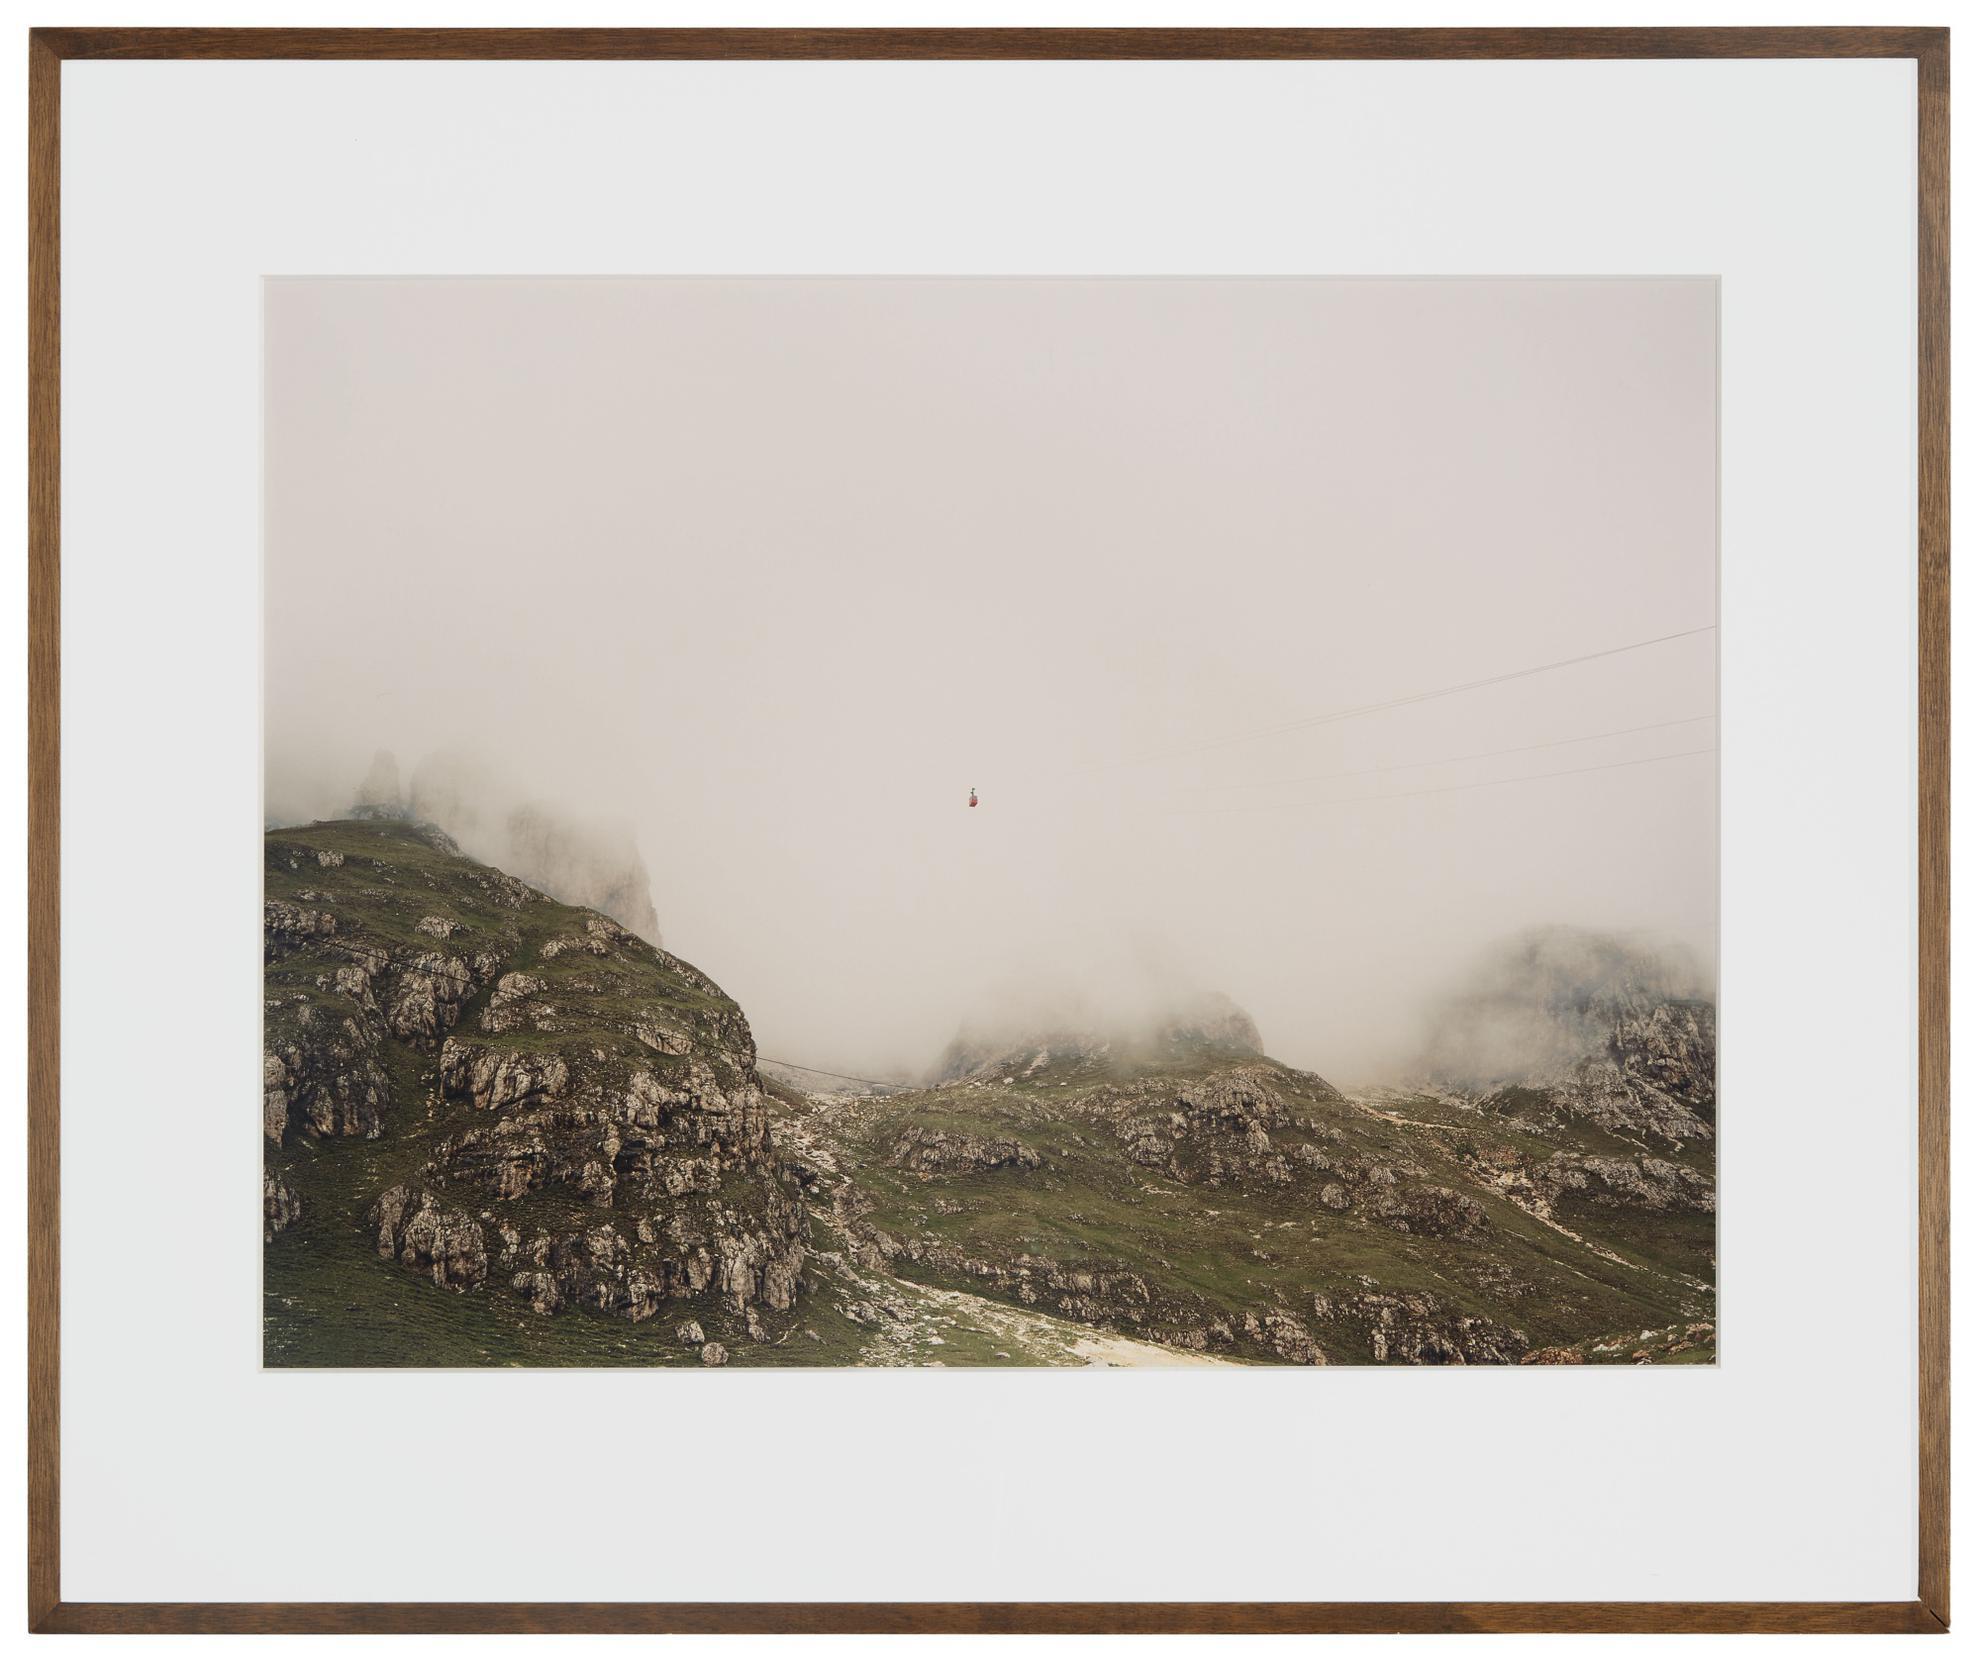 Andreas Gursky-Yeilbohm Dolomiten-1987